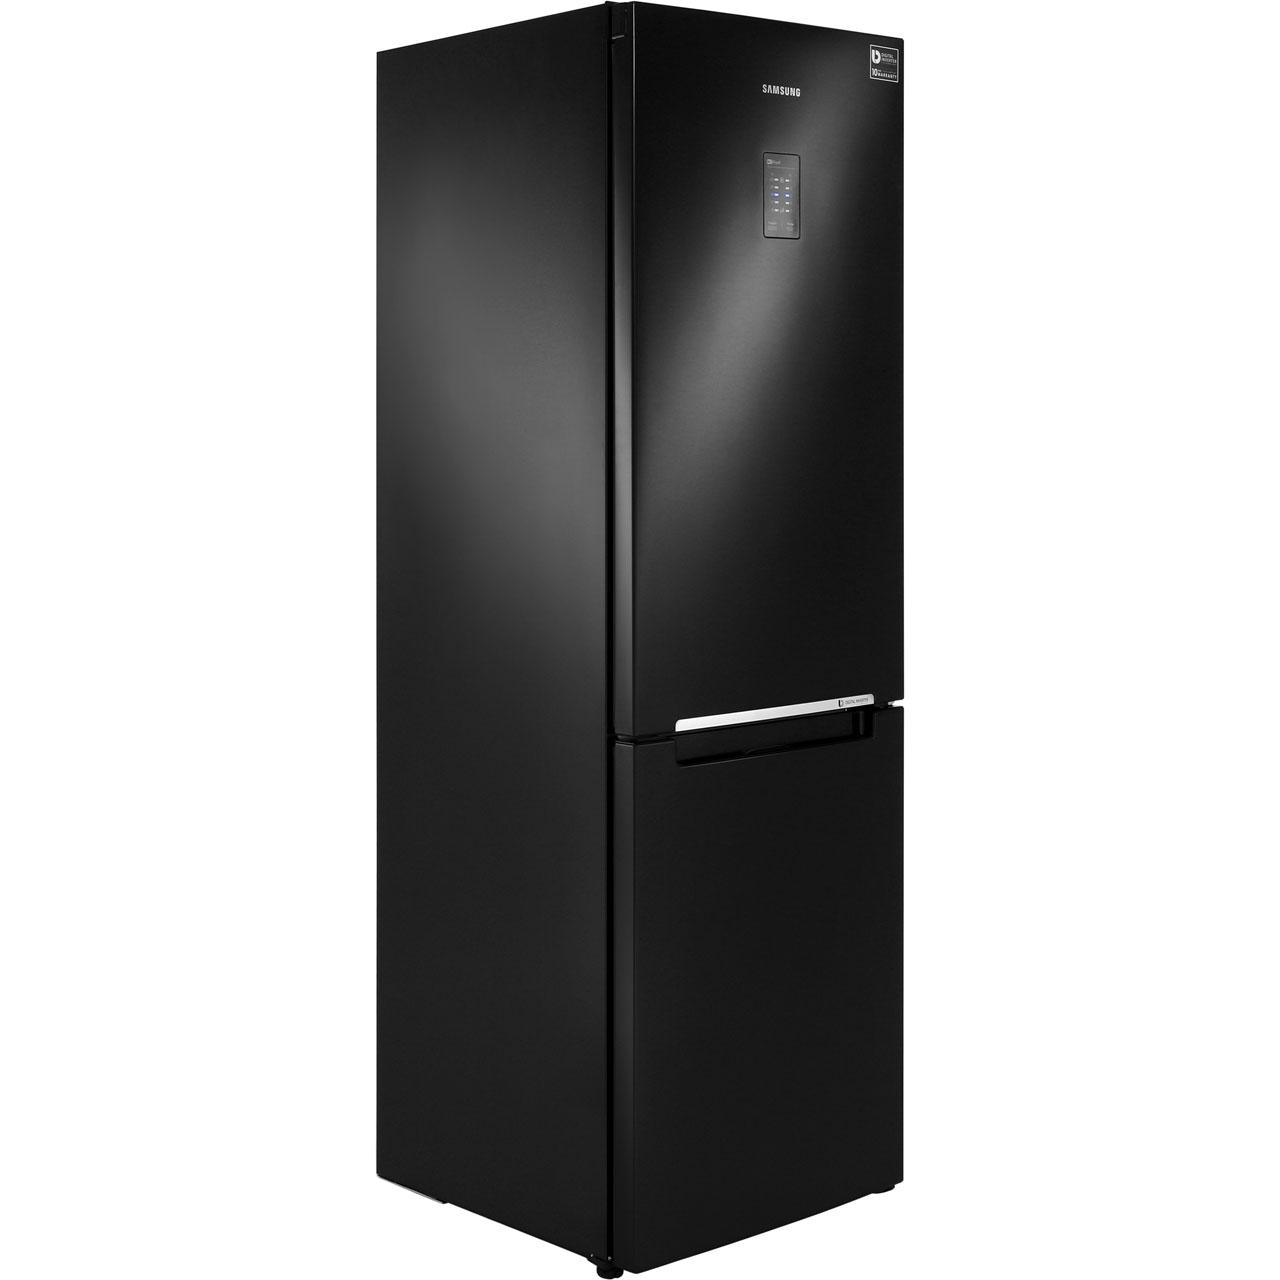 Samsung RB Combi Range RB31FERNDBC Free Standing Fridge Freezer Frost Free in Black